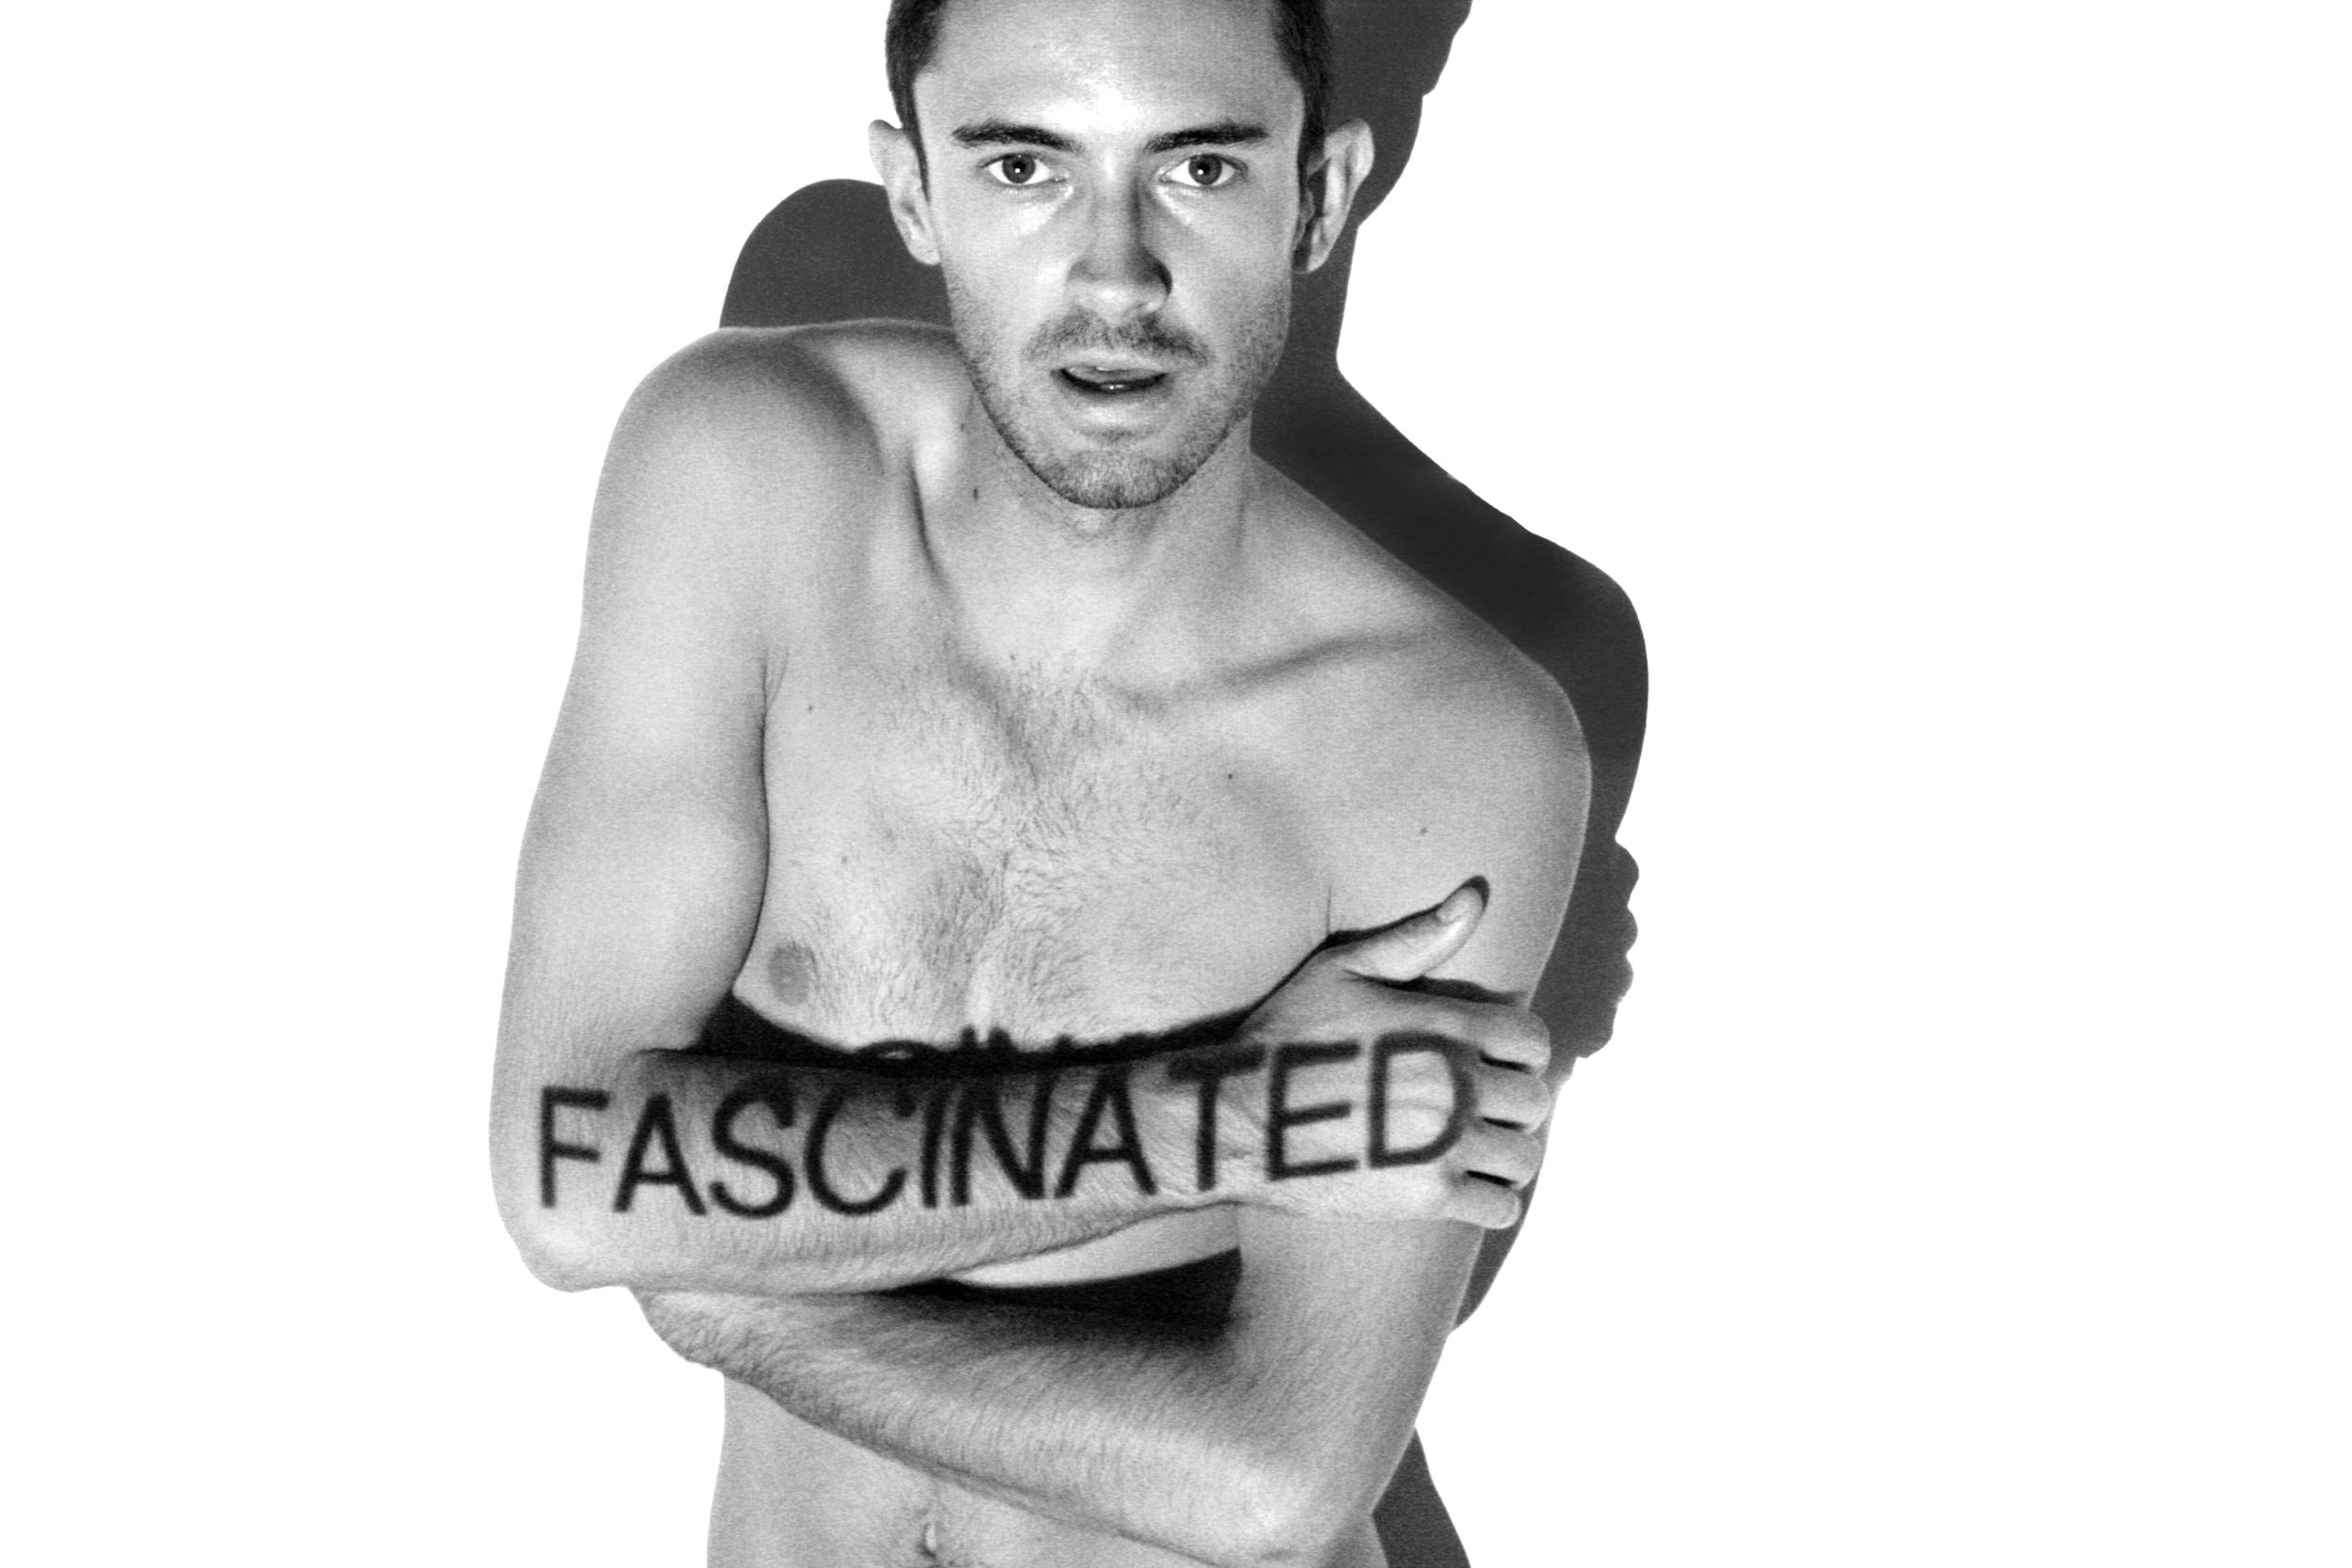 Tyler_Fascinated_WeWoreTheMasks_BW.jpg